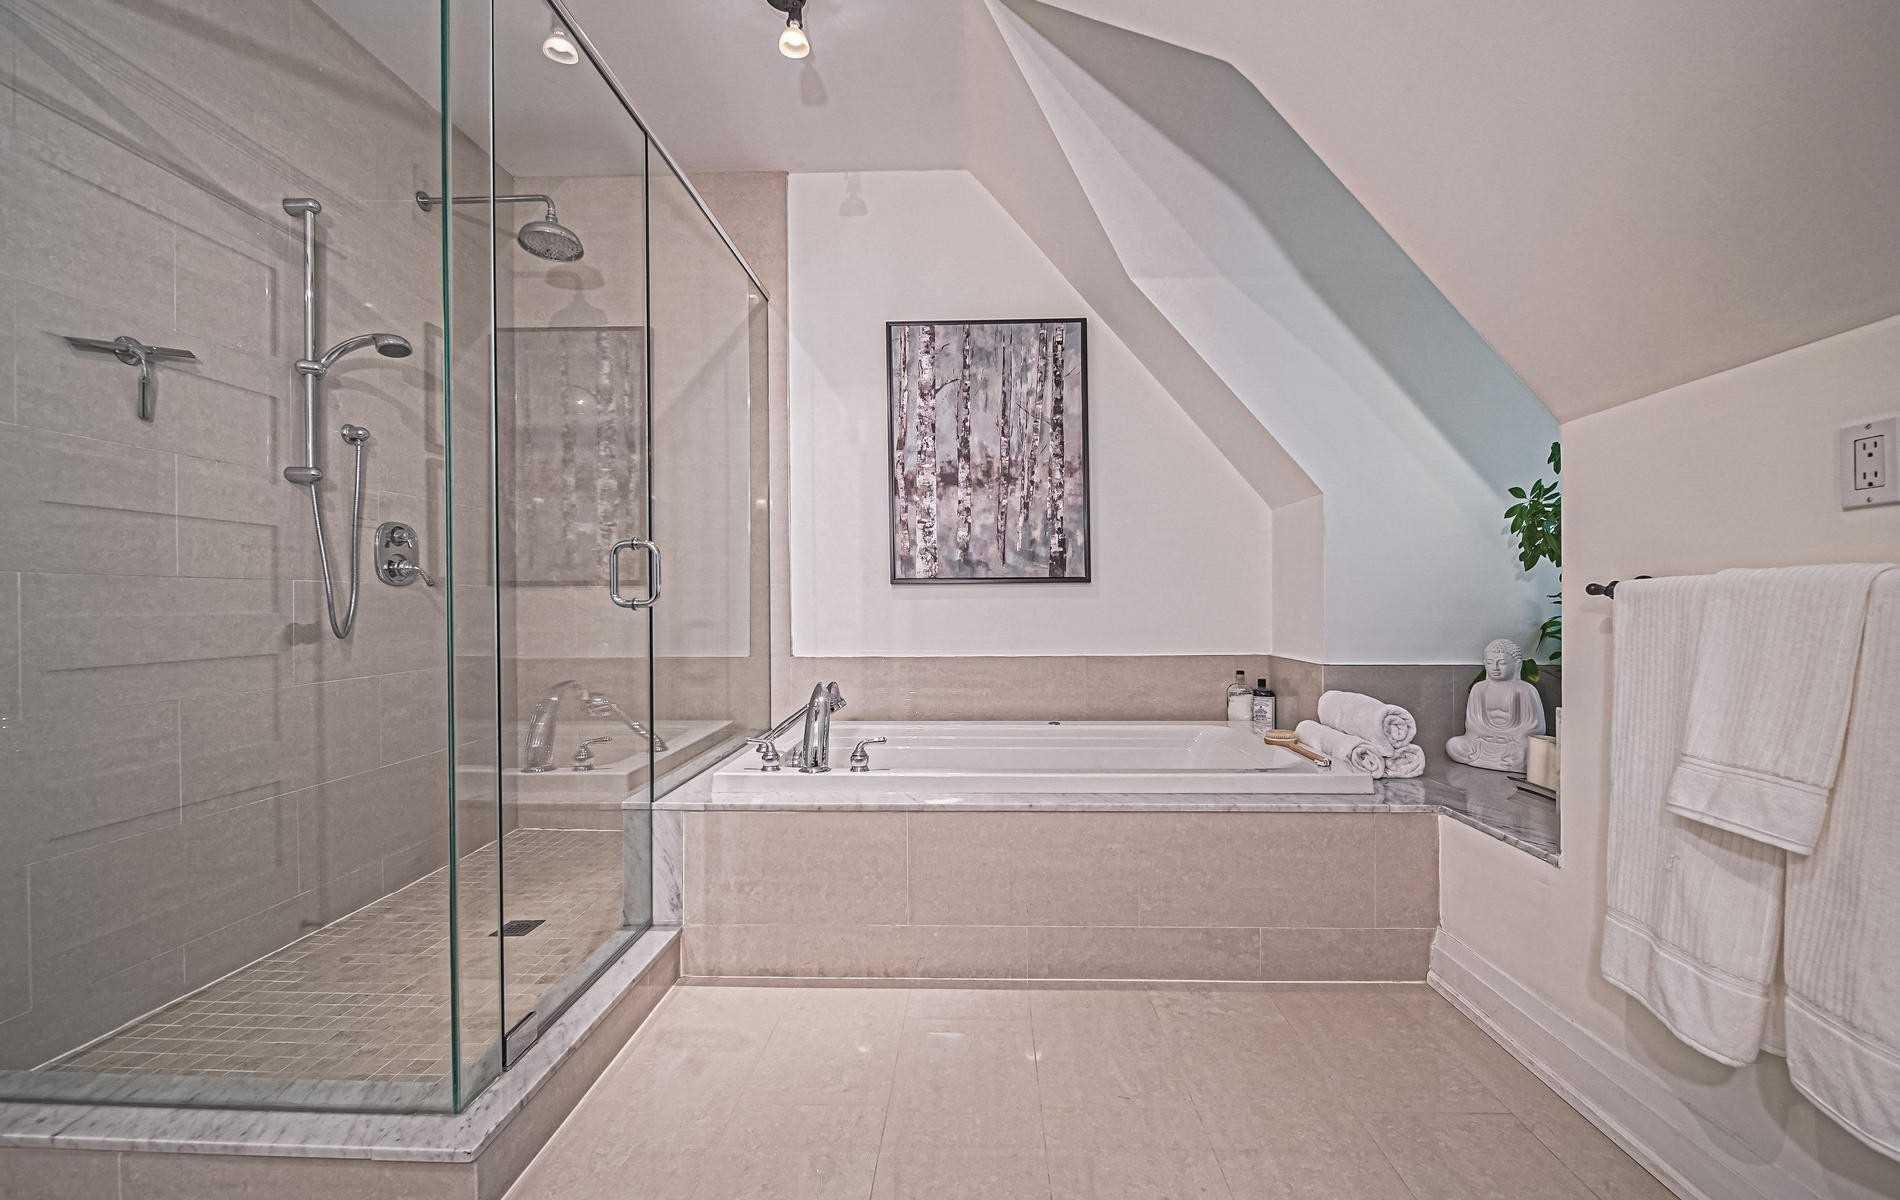 Photo 14: Photos: 216A Hamilton Street in Toronto: South Riverdale House (3-Storey) for sale (Toronto E01)  : MLS®# E4619870